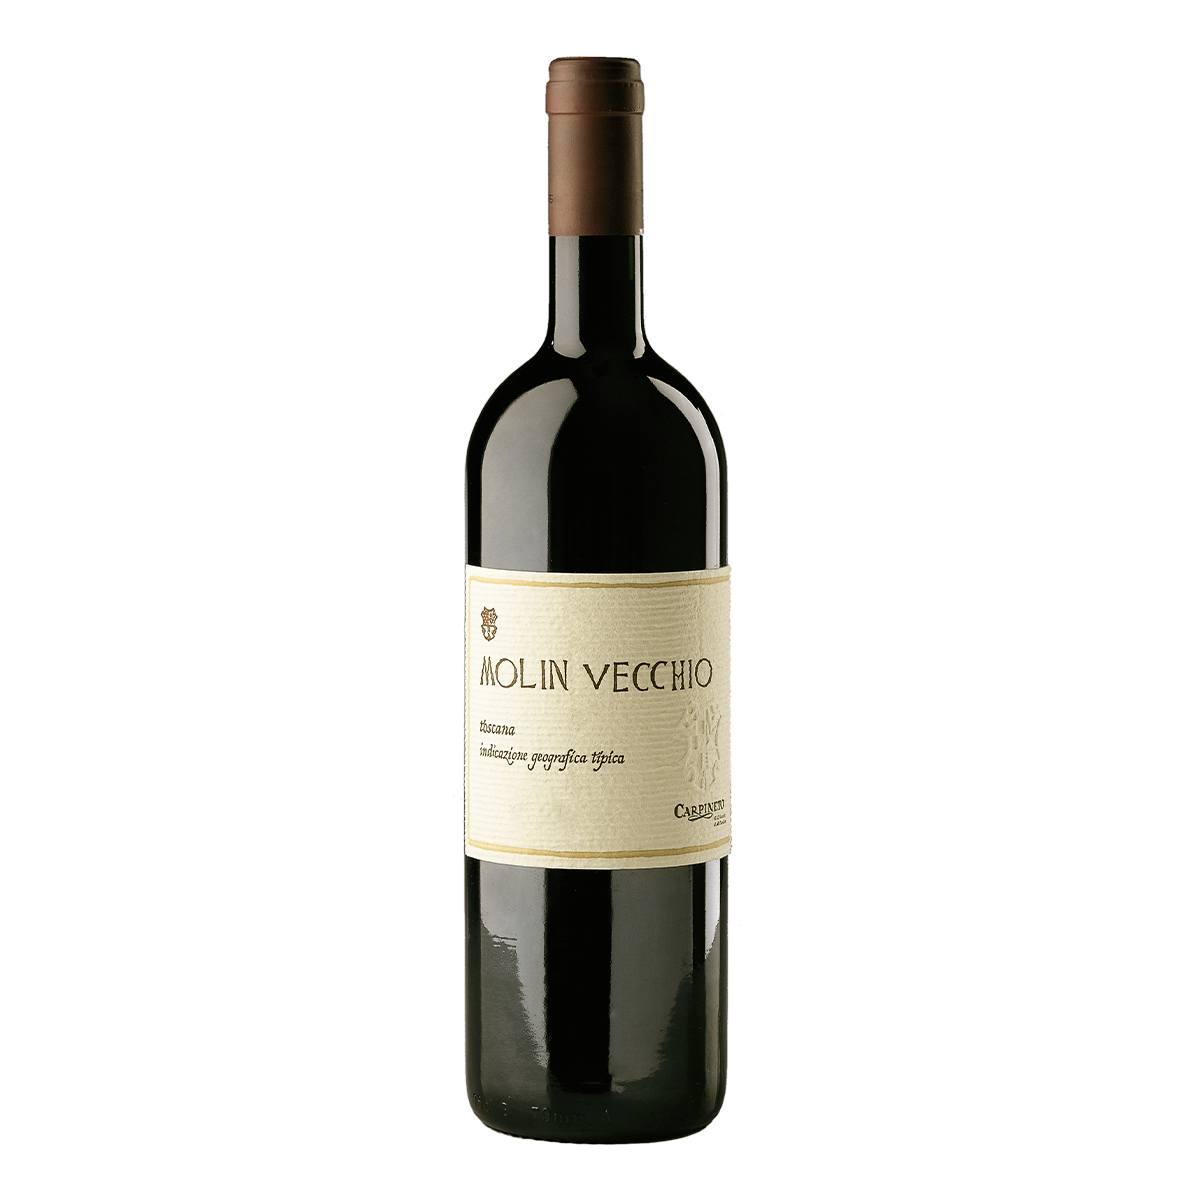 ITTC1301-10 義大利卡品耐托莫林頂級紅酒 Carpineto Molin Vecchio Toscana I.G.T.